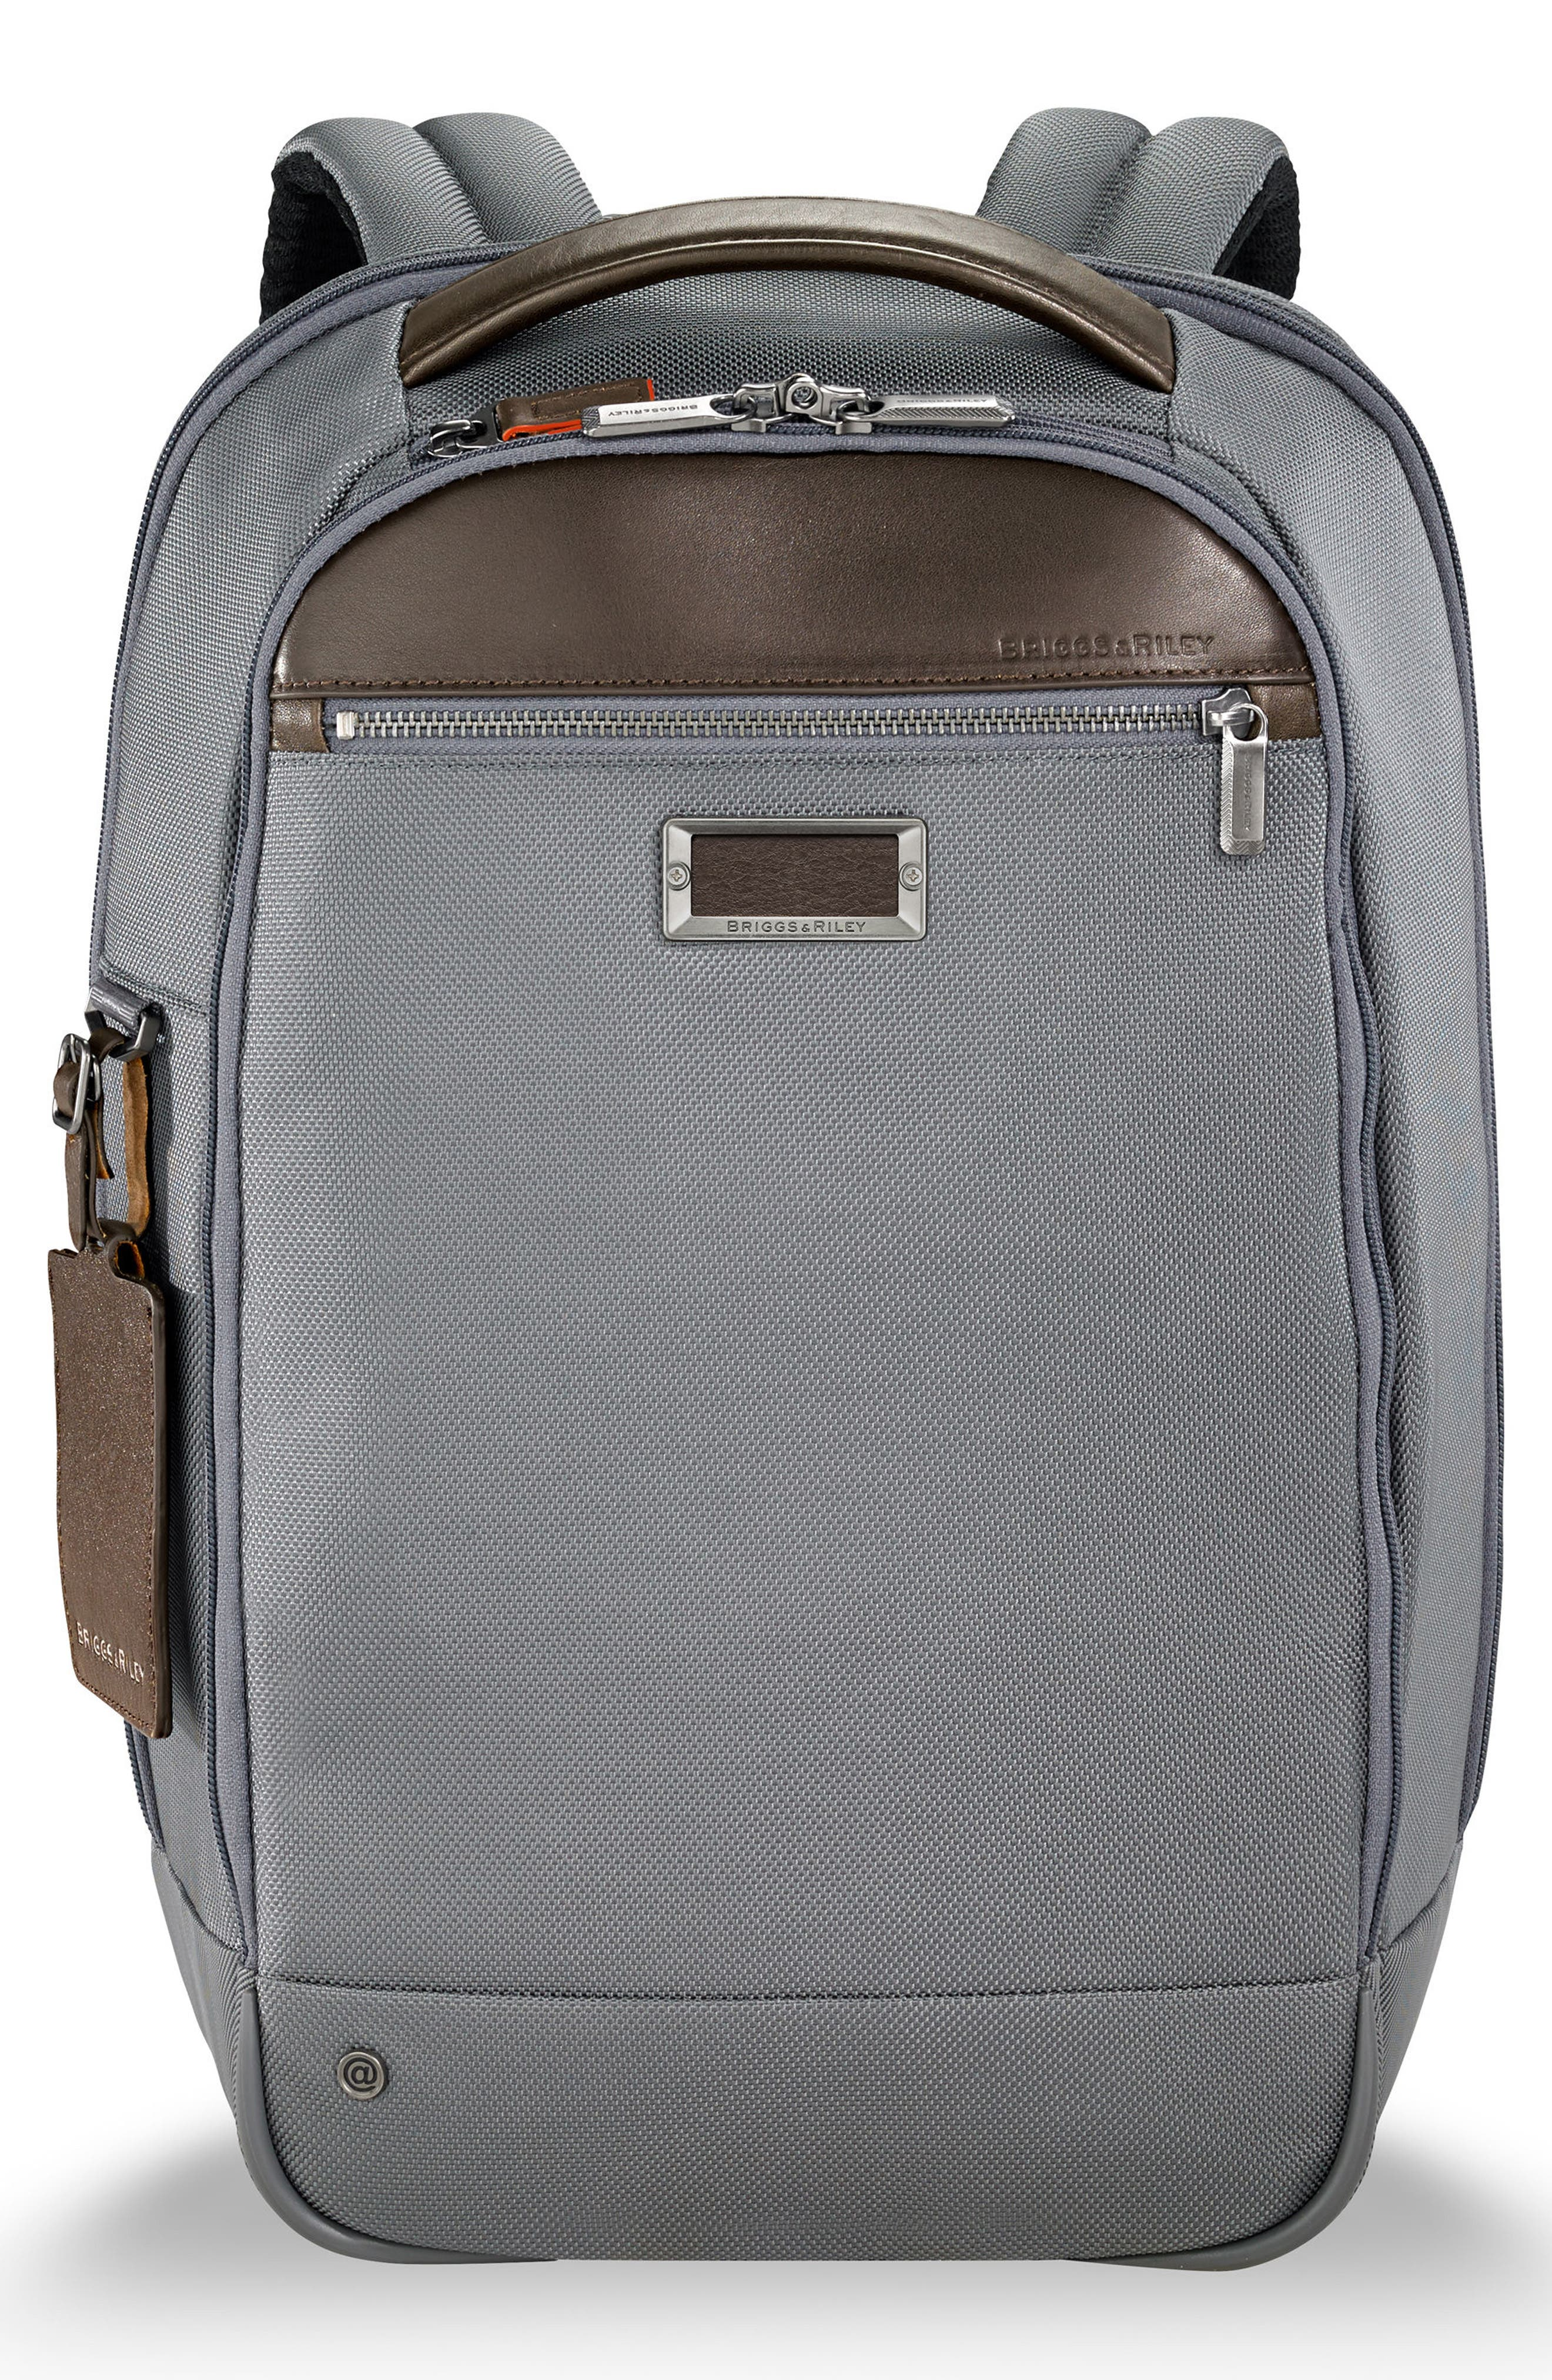 @work Slim Backpack,                         Main,                         color, GREY